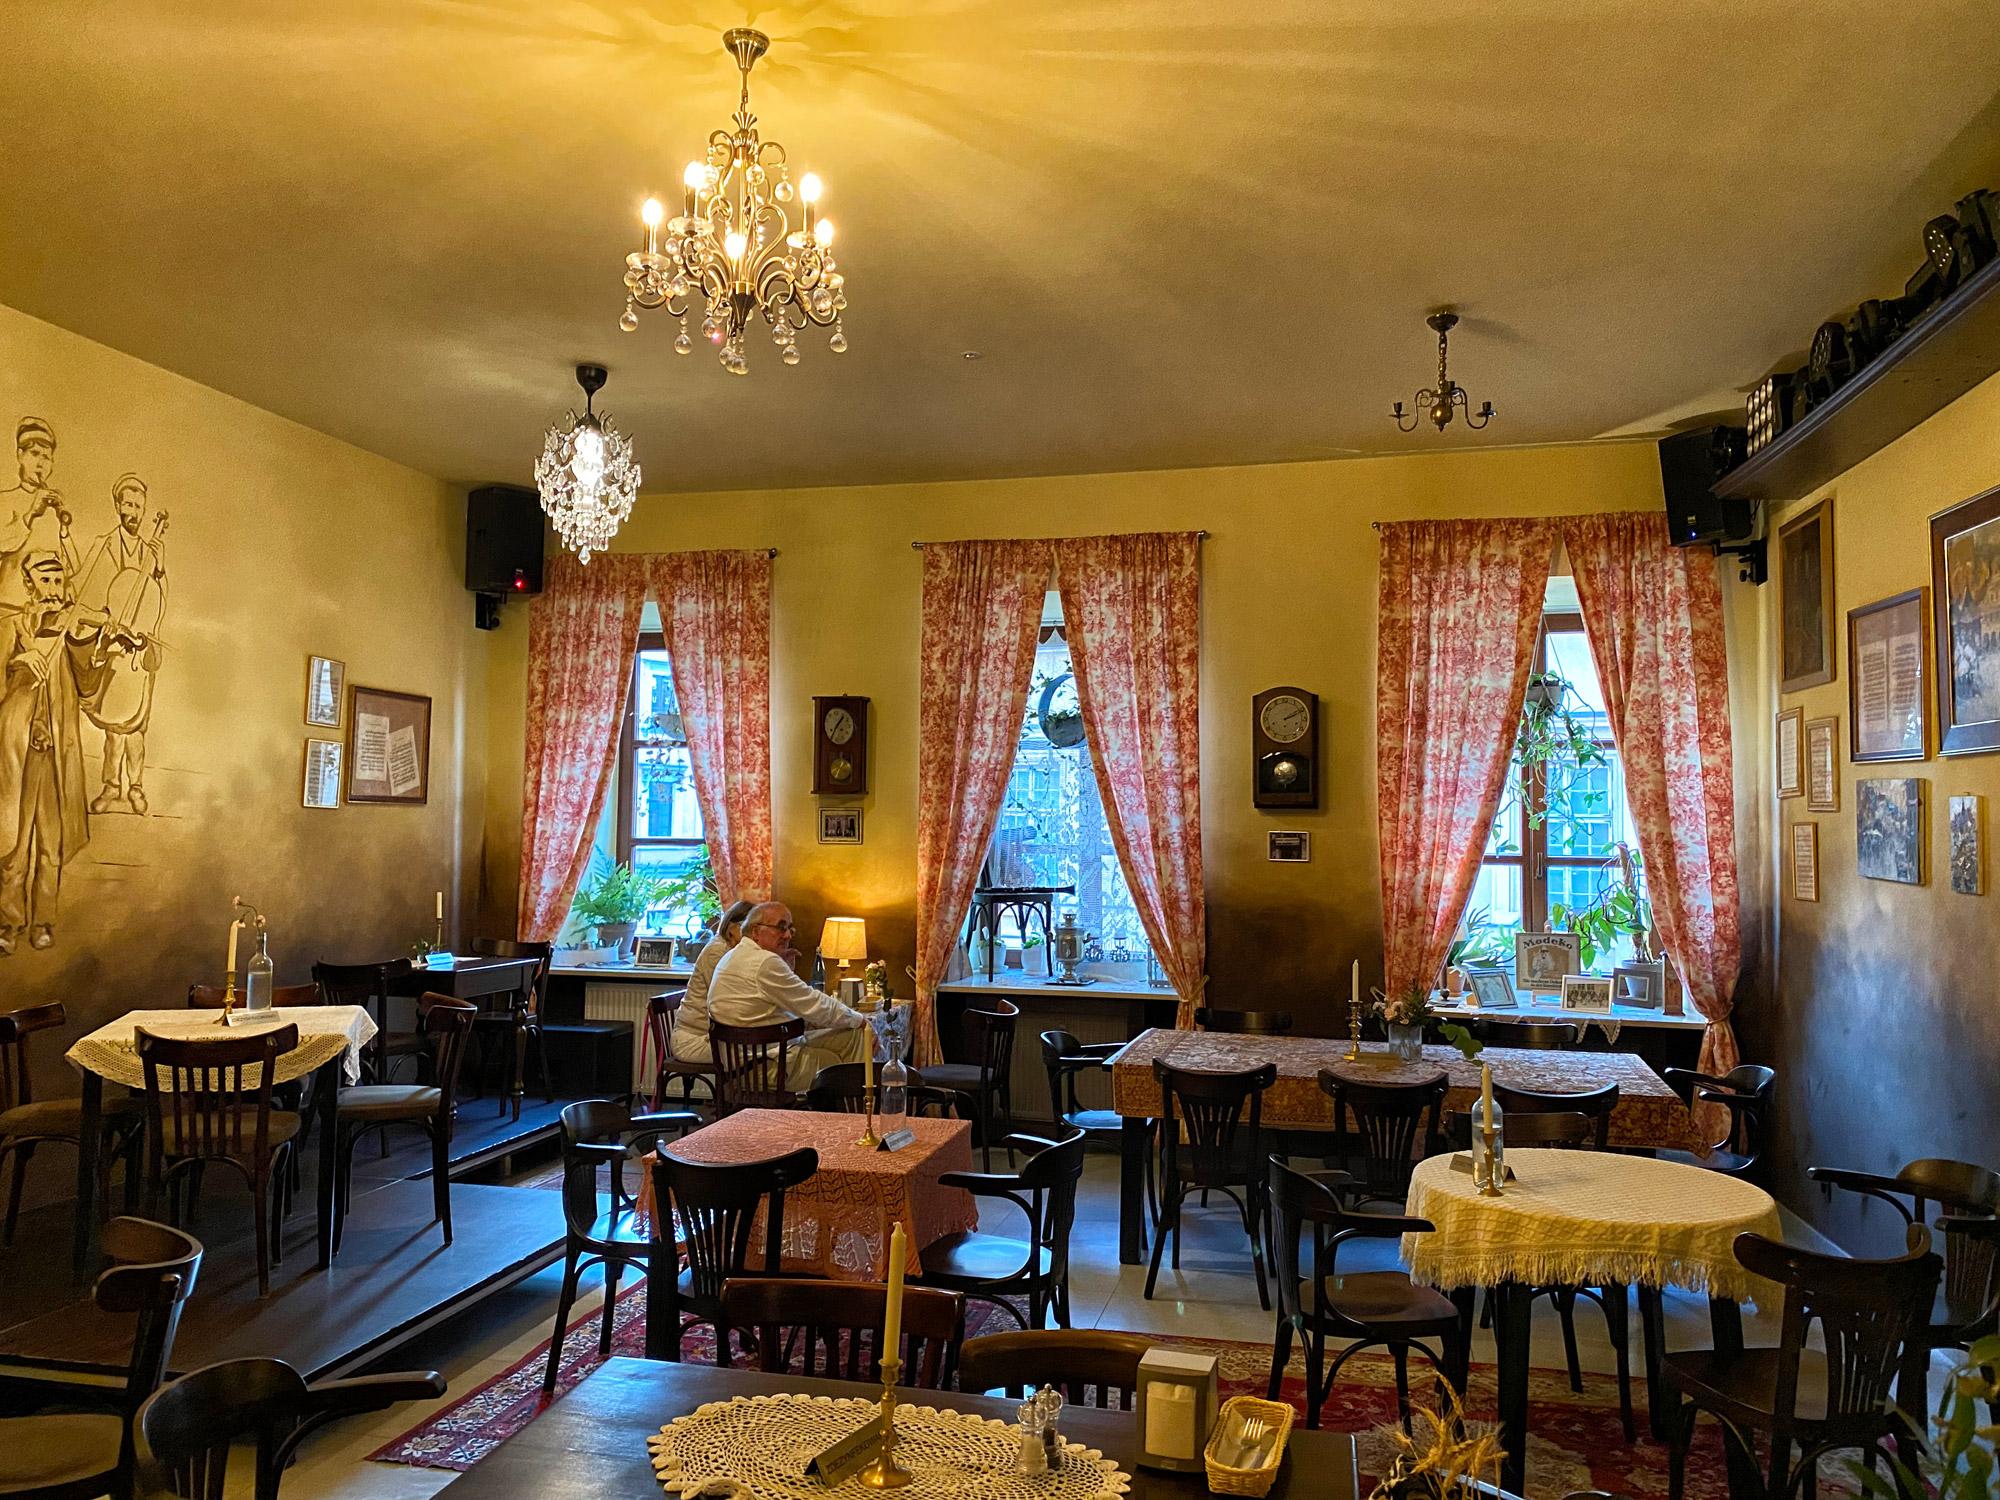 Lubelskie regio - Lublin Mandragora Restaurant